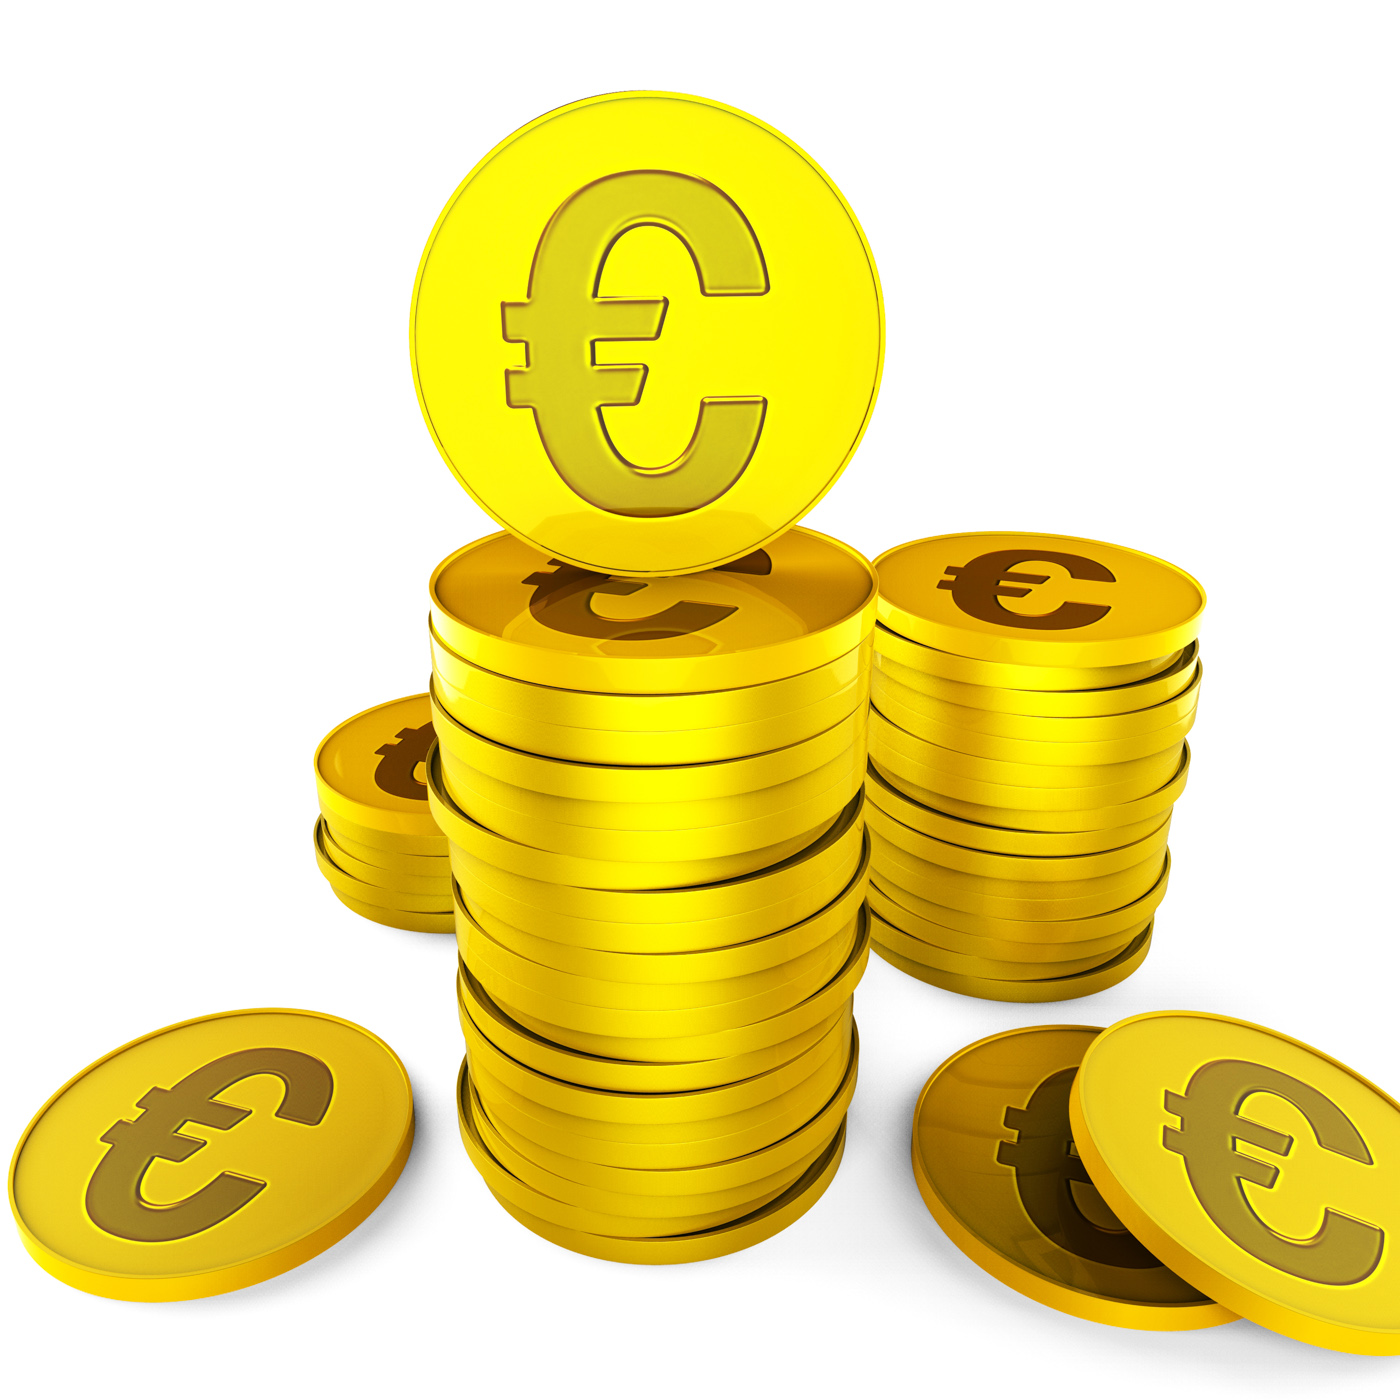 Euro savings represents european euros and money photo